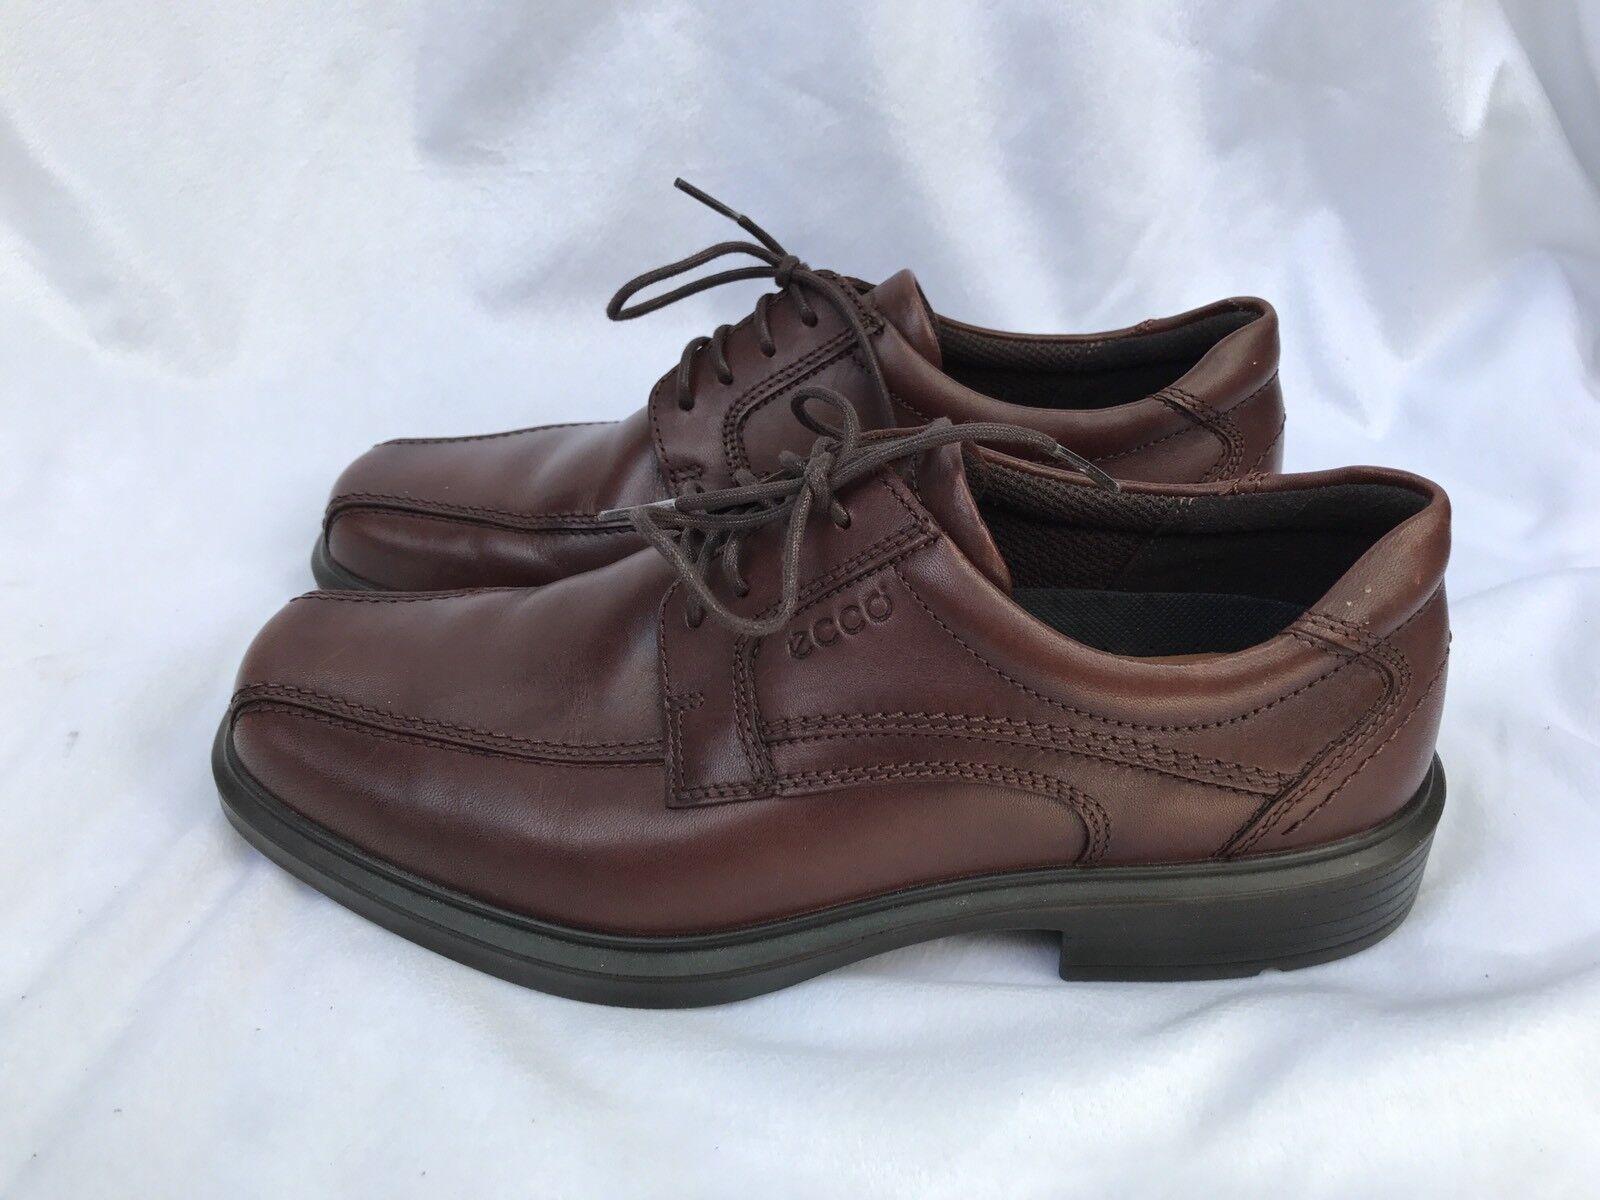 Ecco Men's Helsinki 50104 Brown Leather Lace Up Dress shoes 40